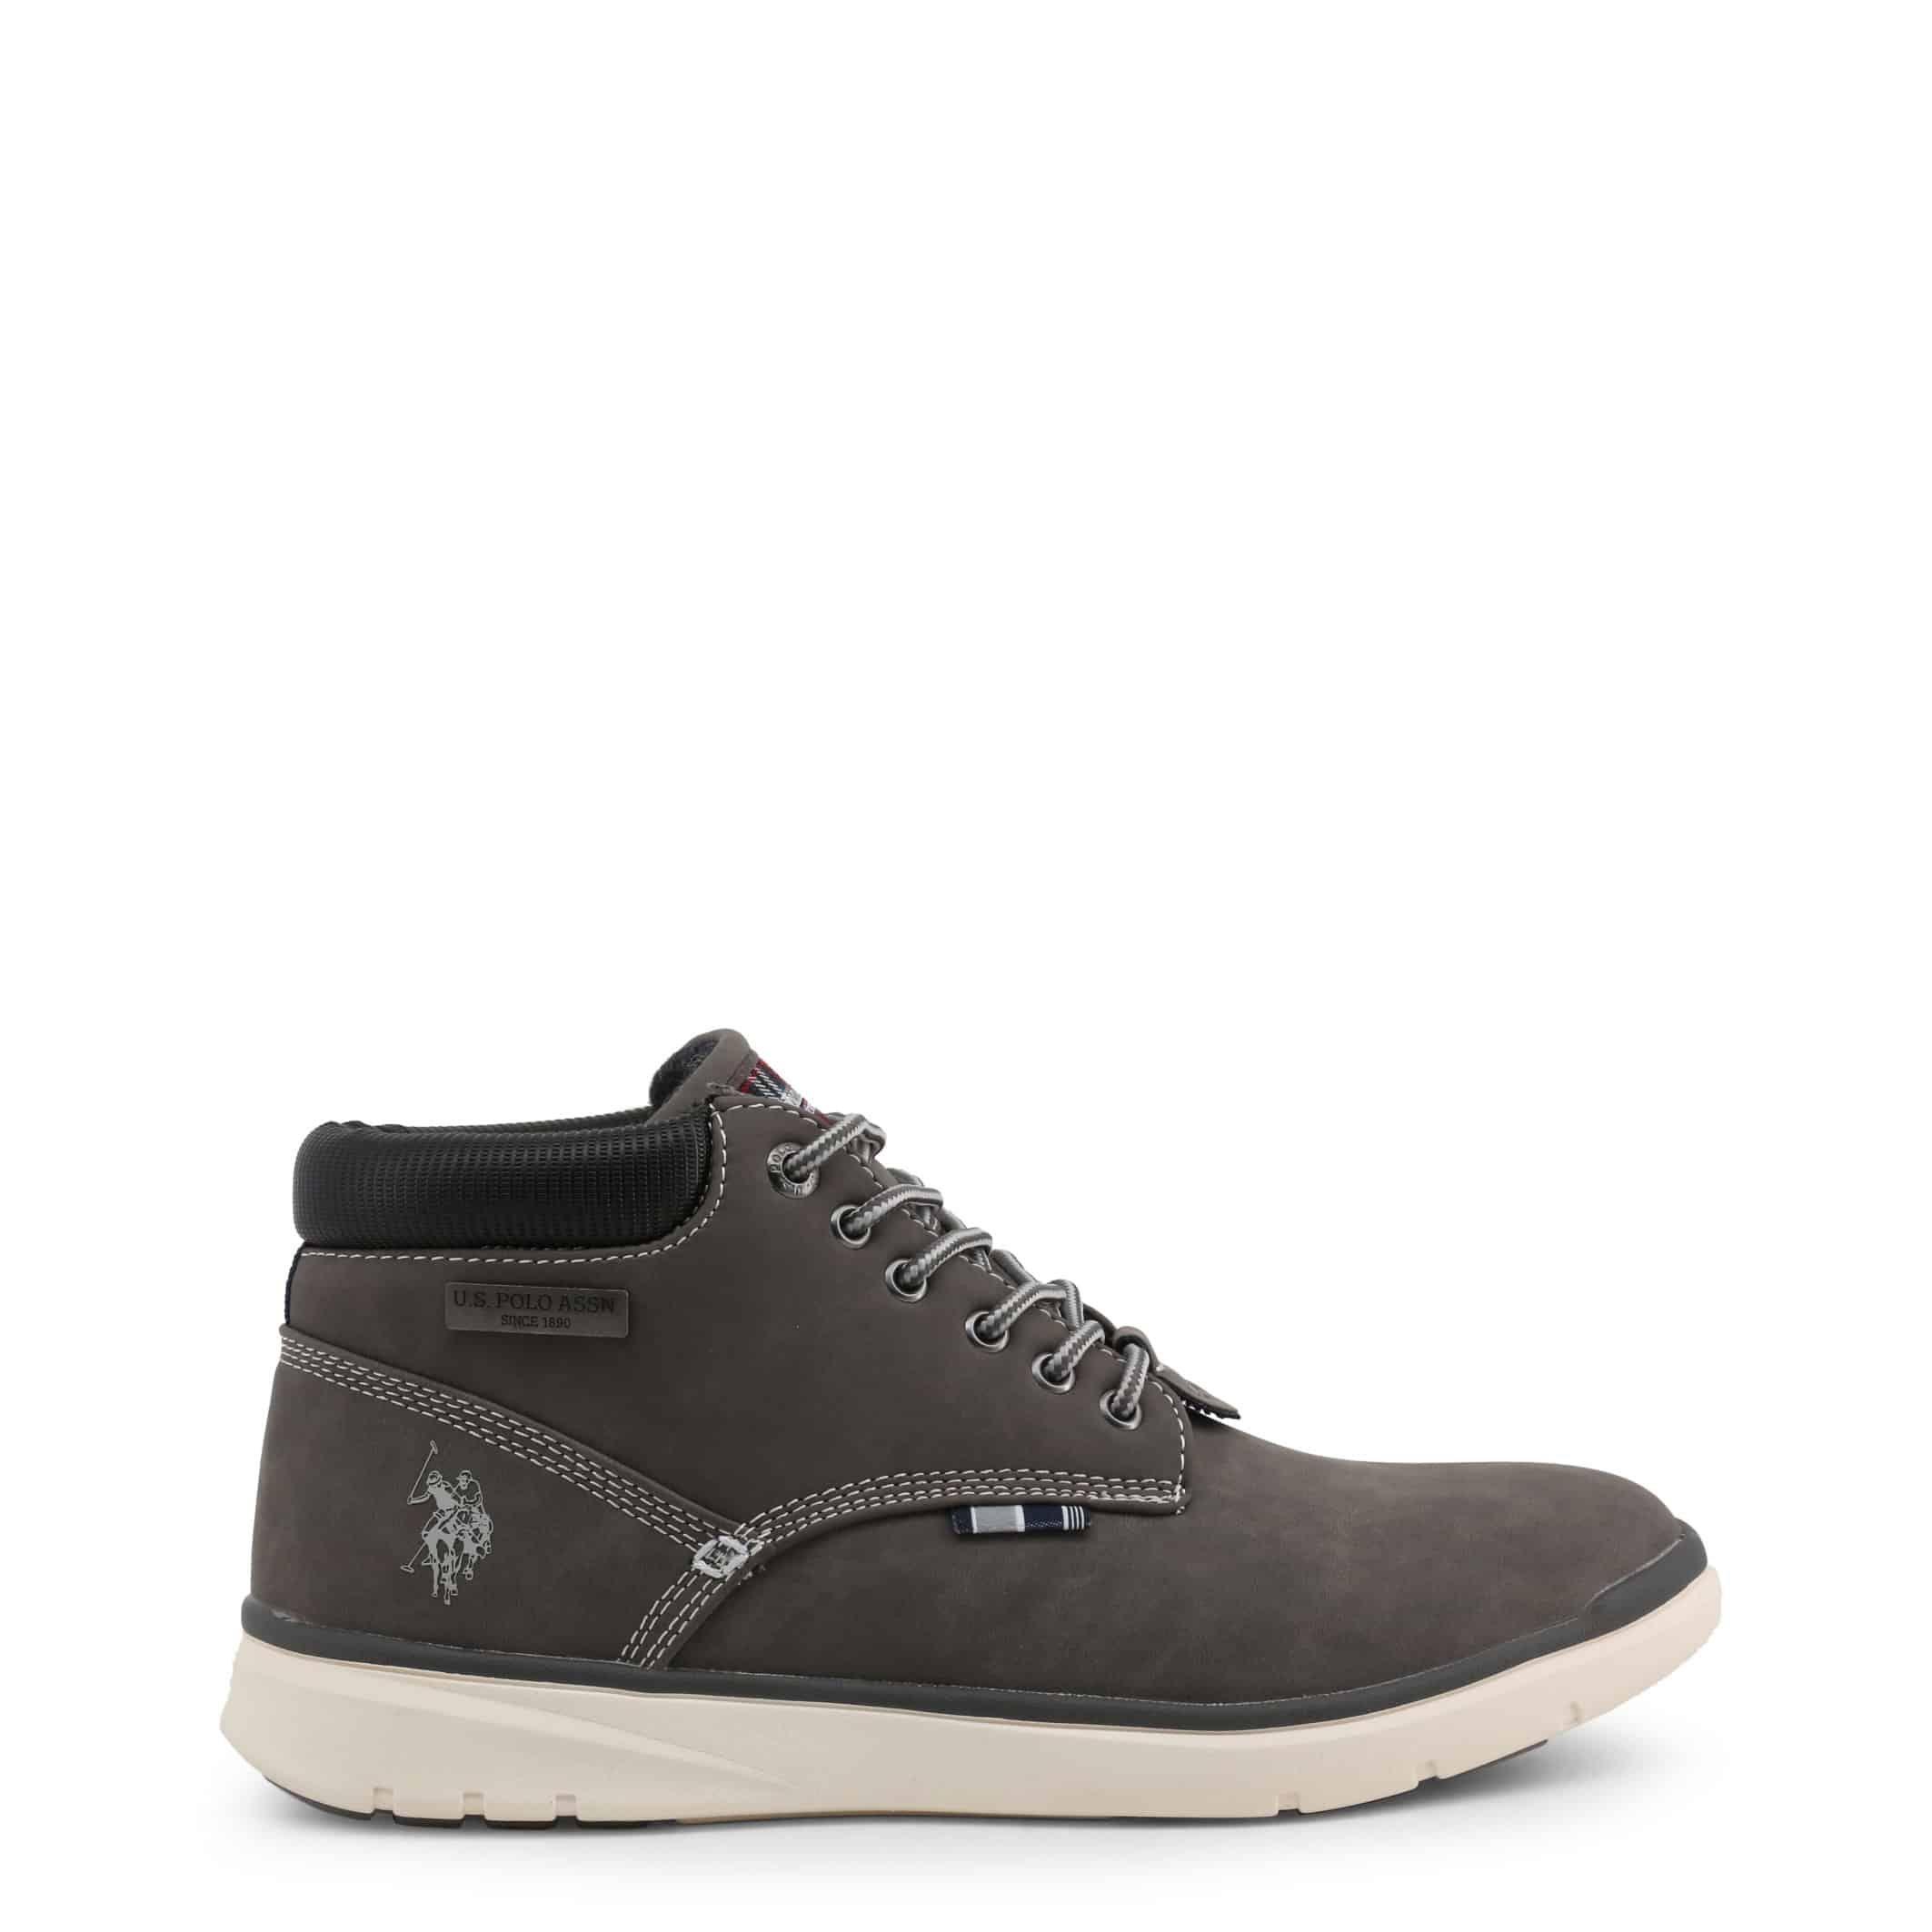 Sneakers U.S. Polo Assn. – YGOR4082W8